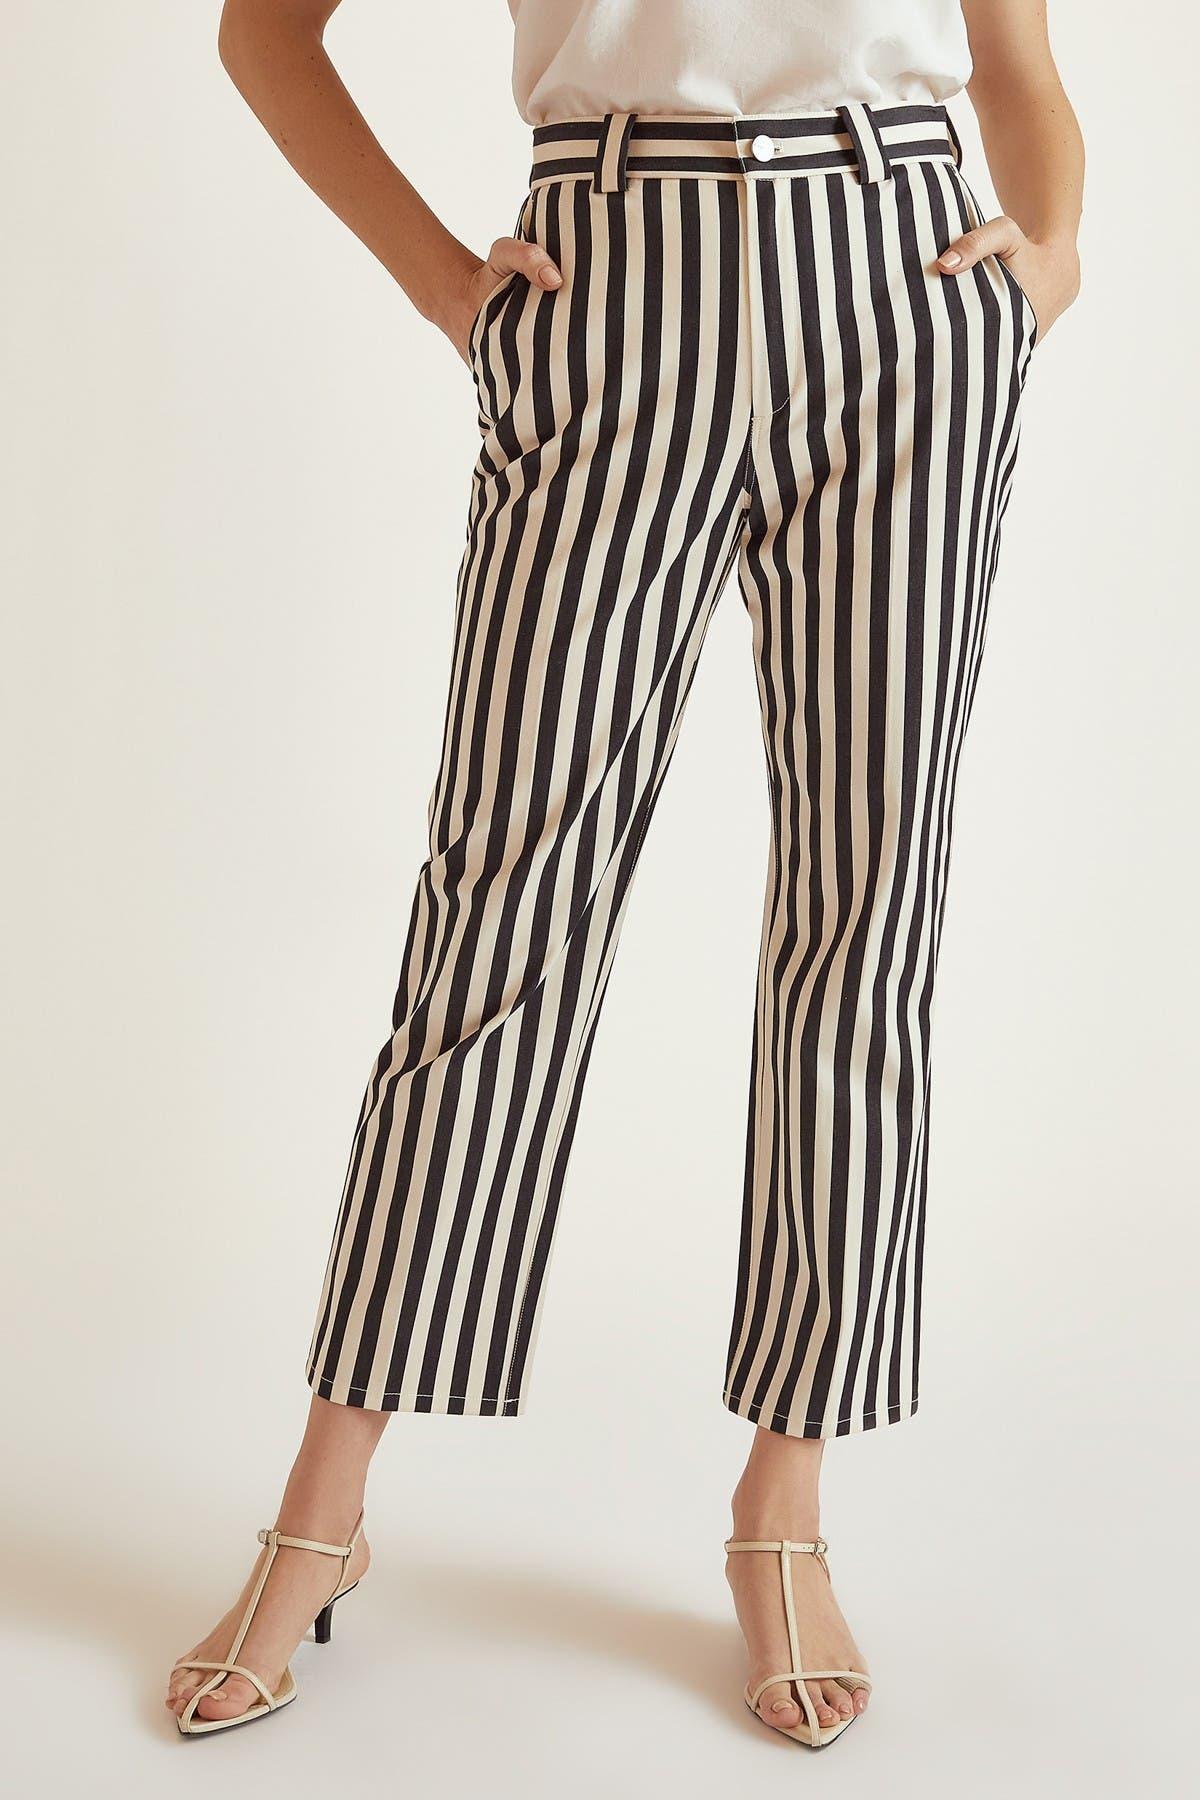 Image of BALDWIN Bridgette Stripe Straight Leg Pants